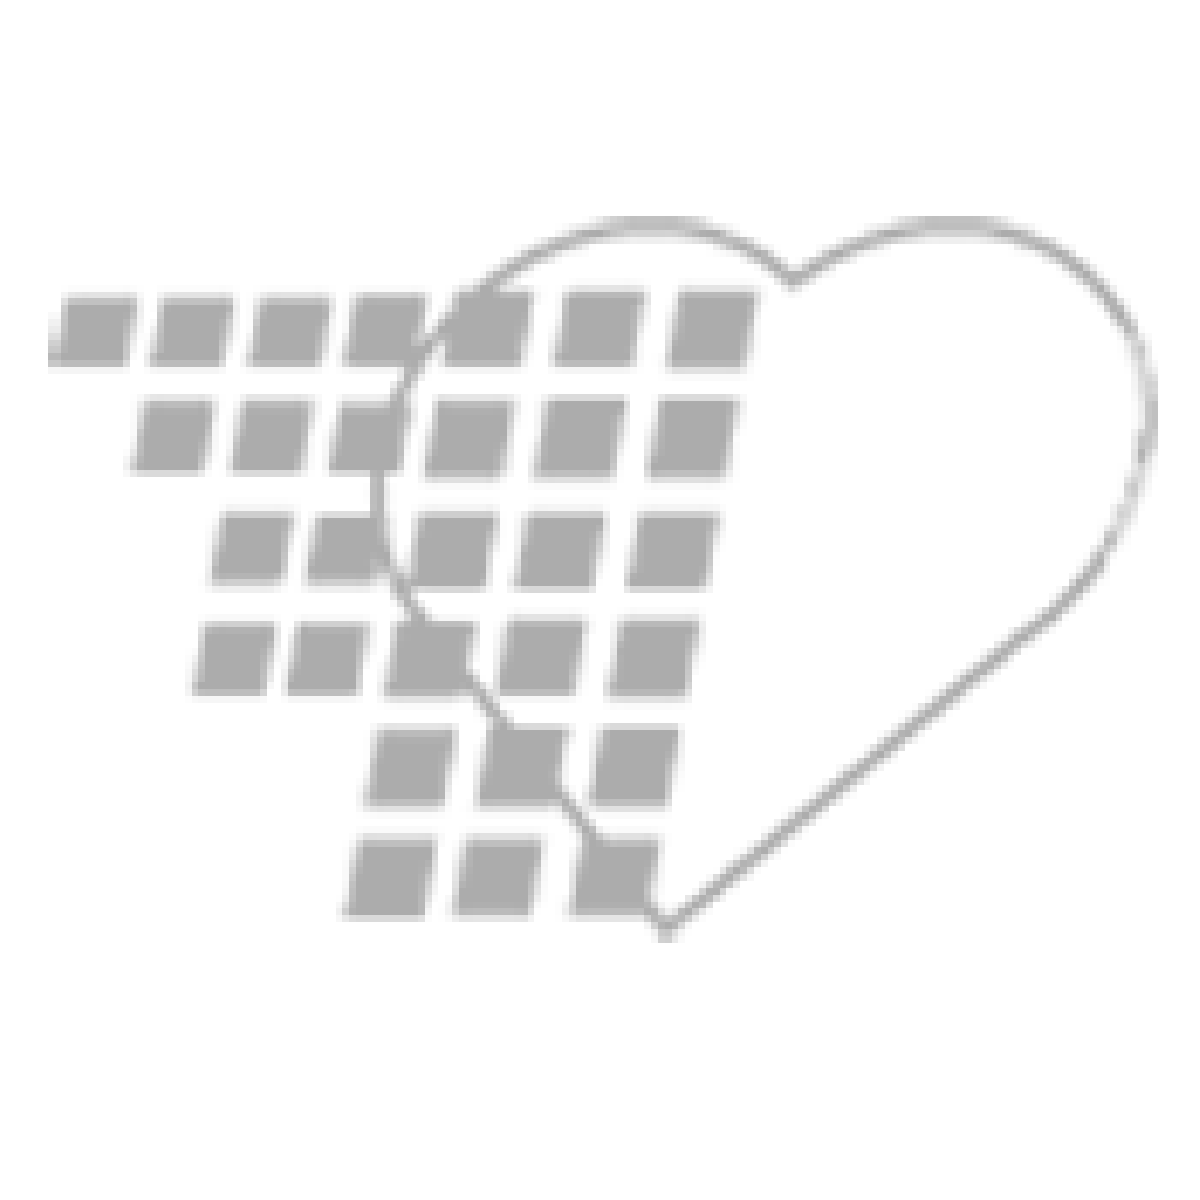 02-20-0740 - Multikuf   Portable 5 Cuff Sphyg Kit